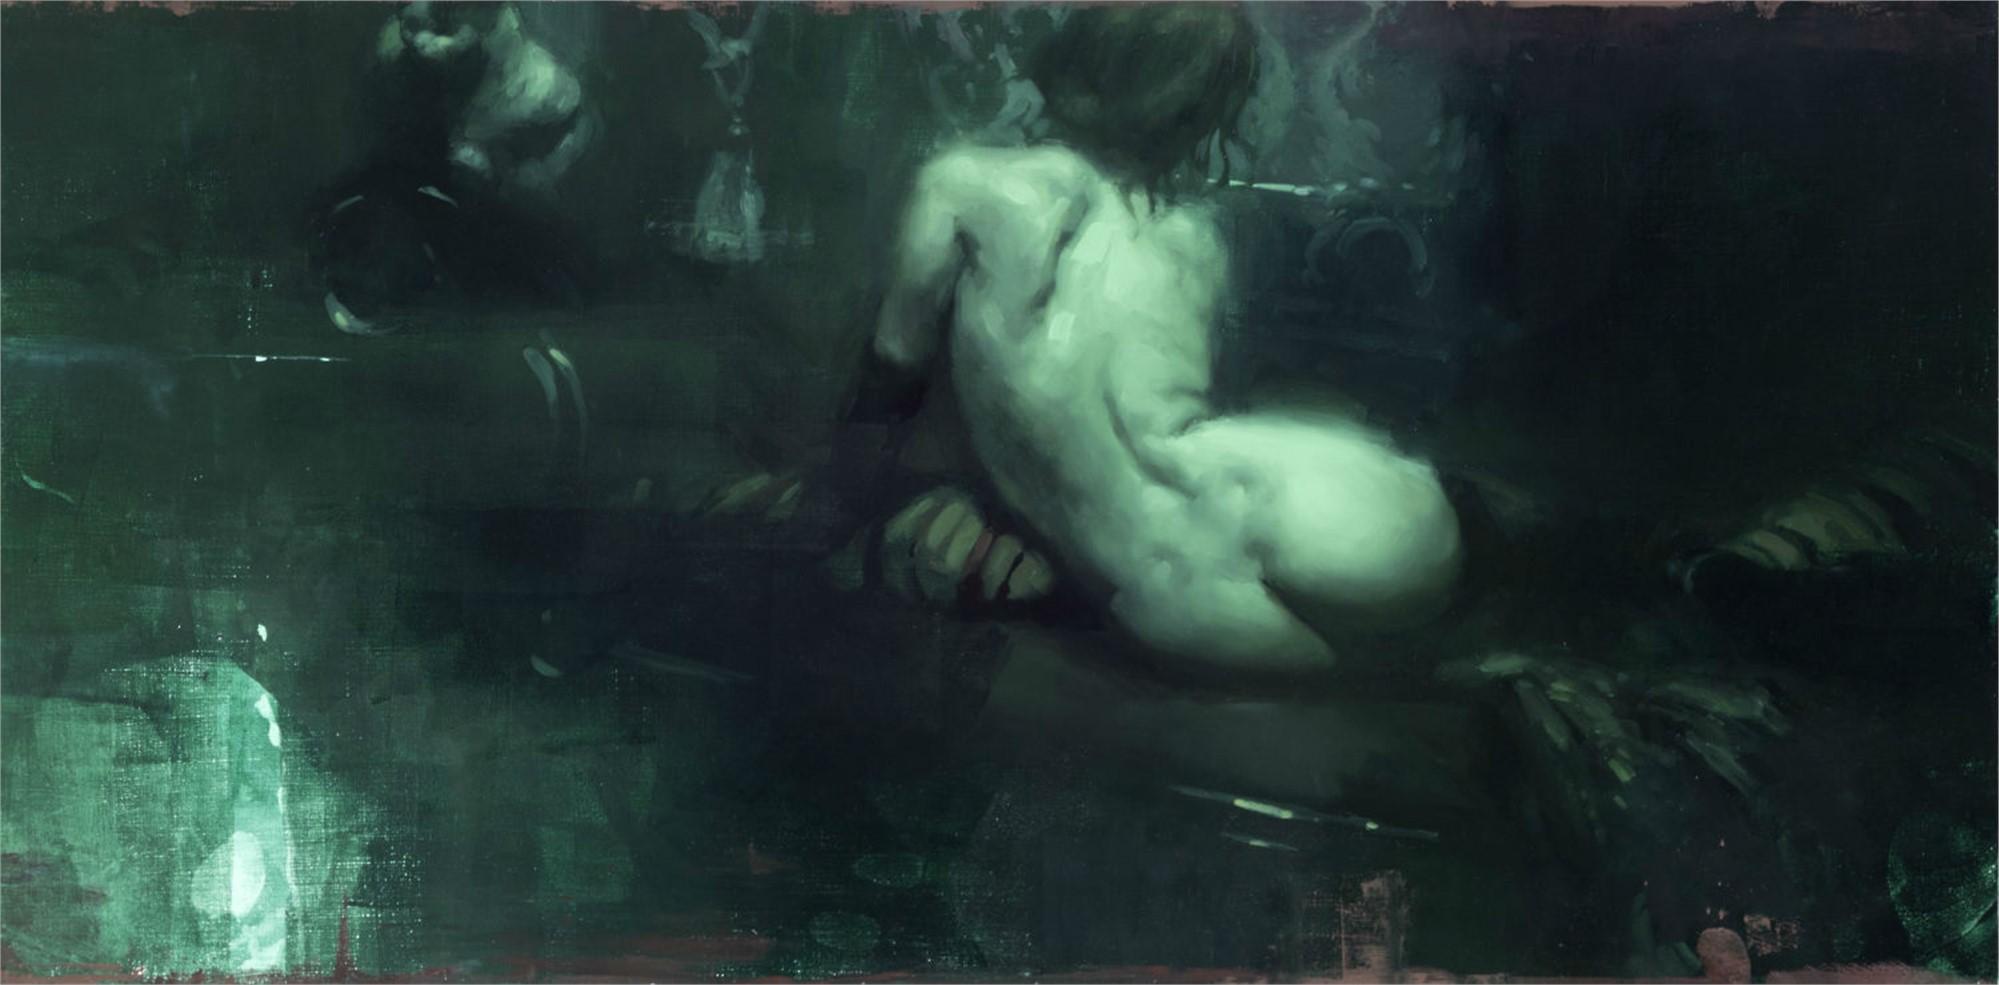 Lure by Jeremy Mann